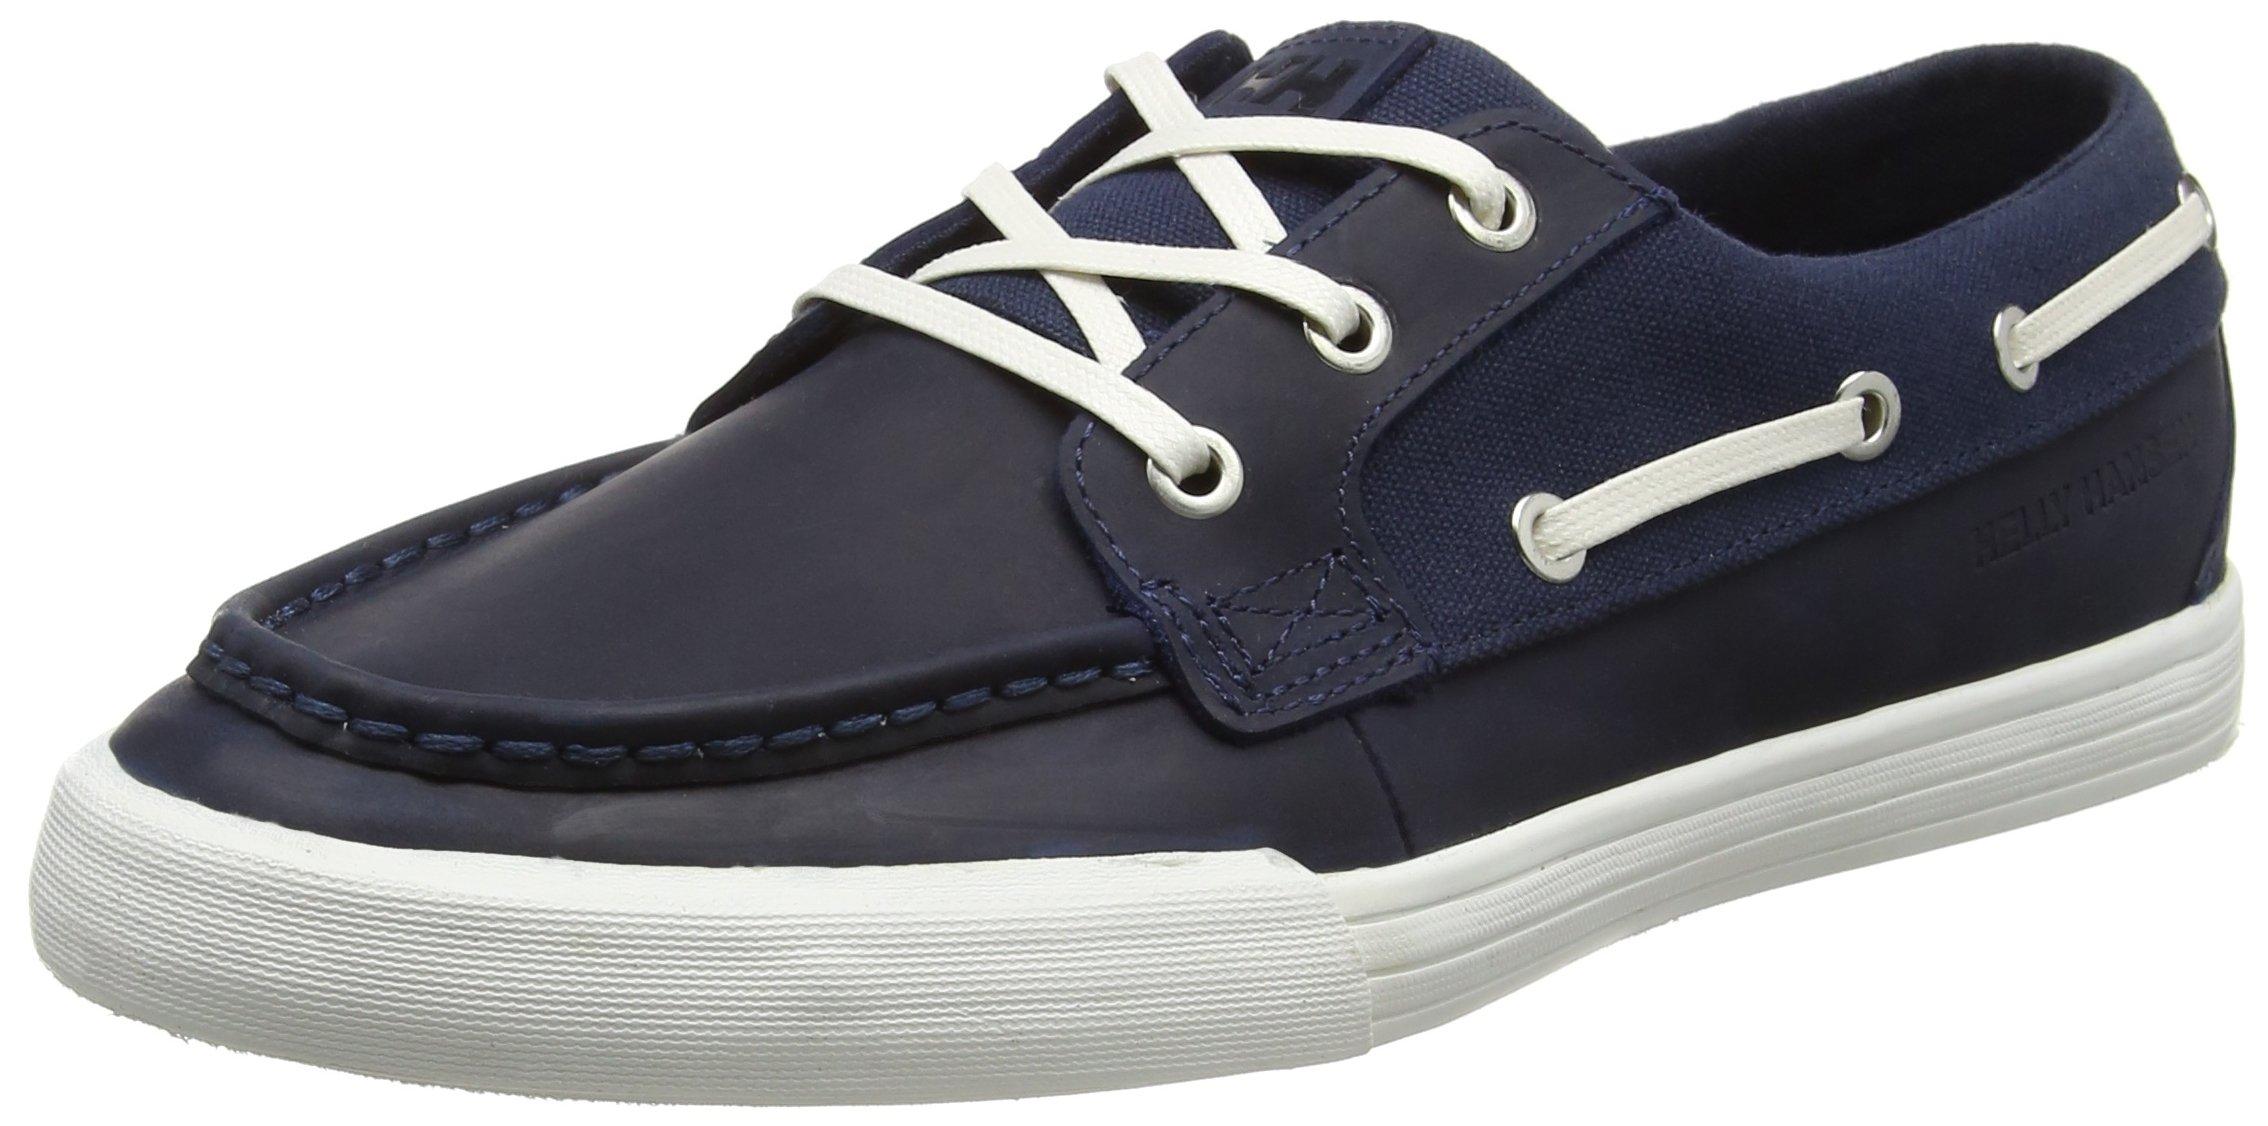 Helly Hansen Men's Framnes 2 Fashion Sneaker, Pabst/Navy/Off White, 9 by Helly-Hansen